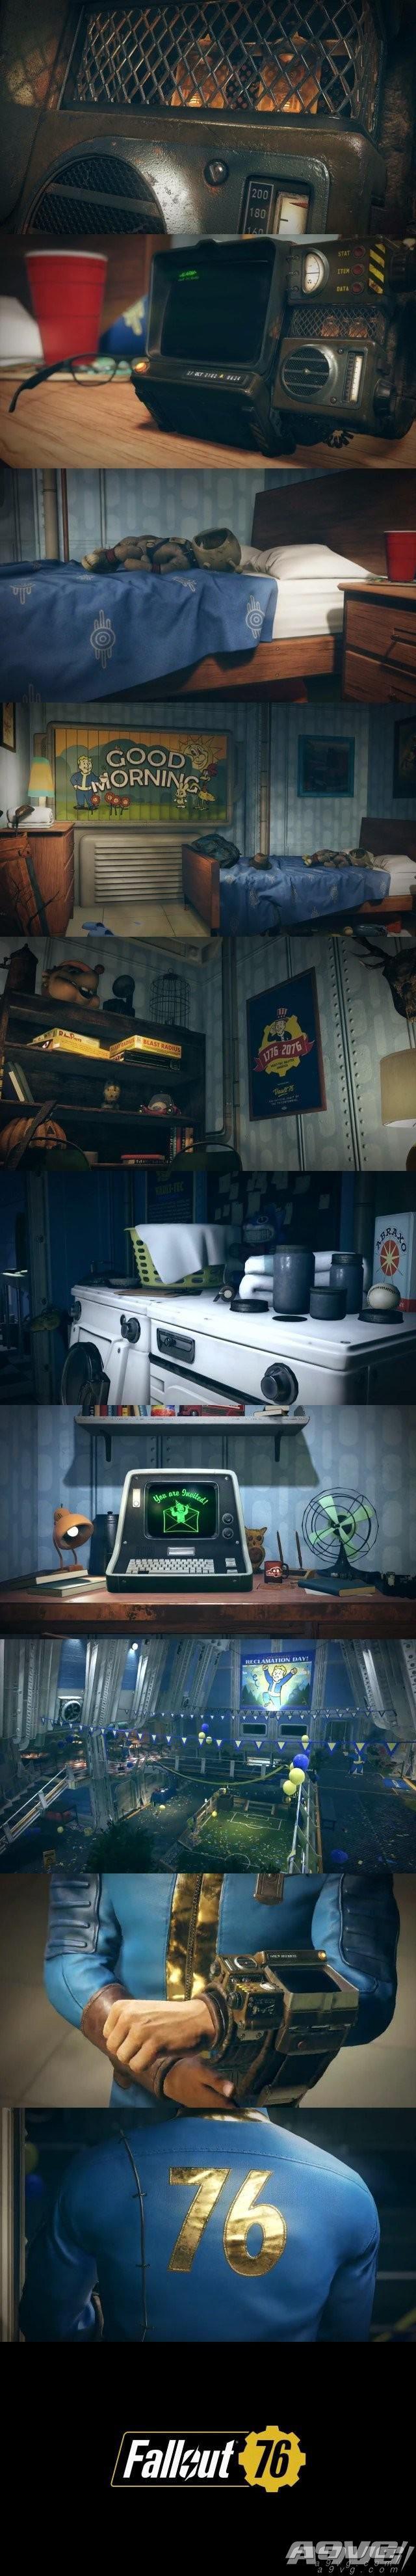 Bethesda发表新作《辐射76》 更多消息将在E3公布